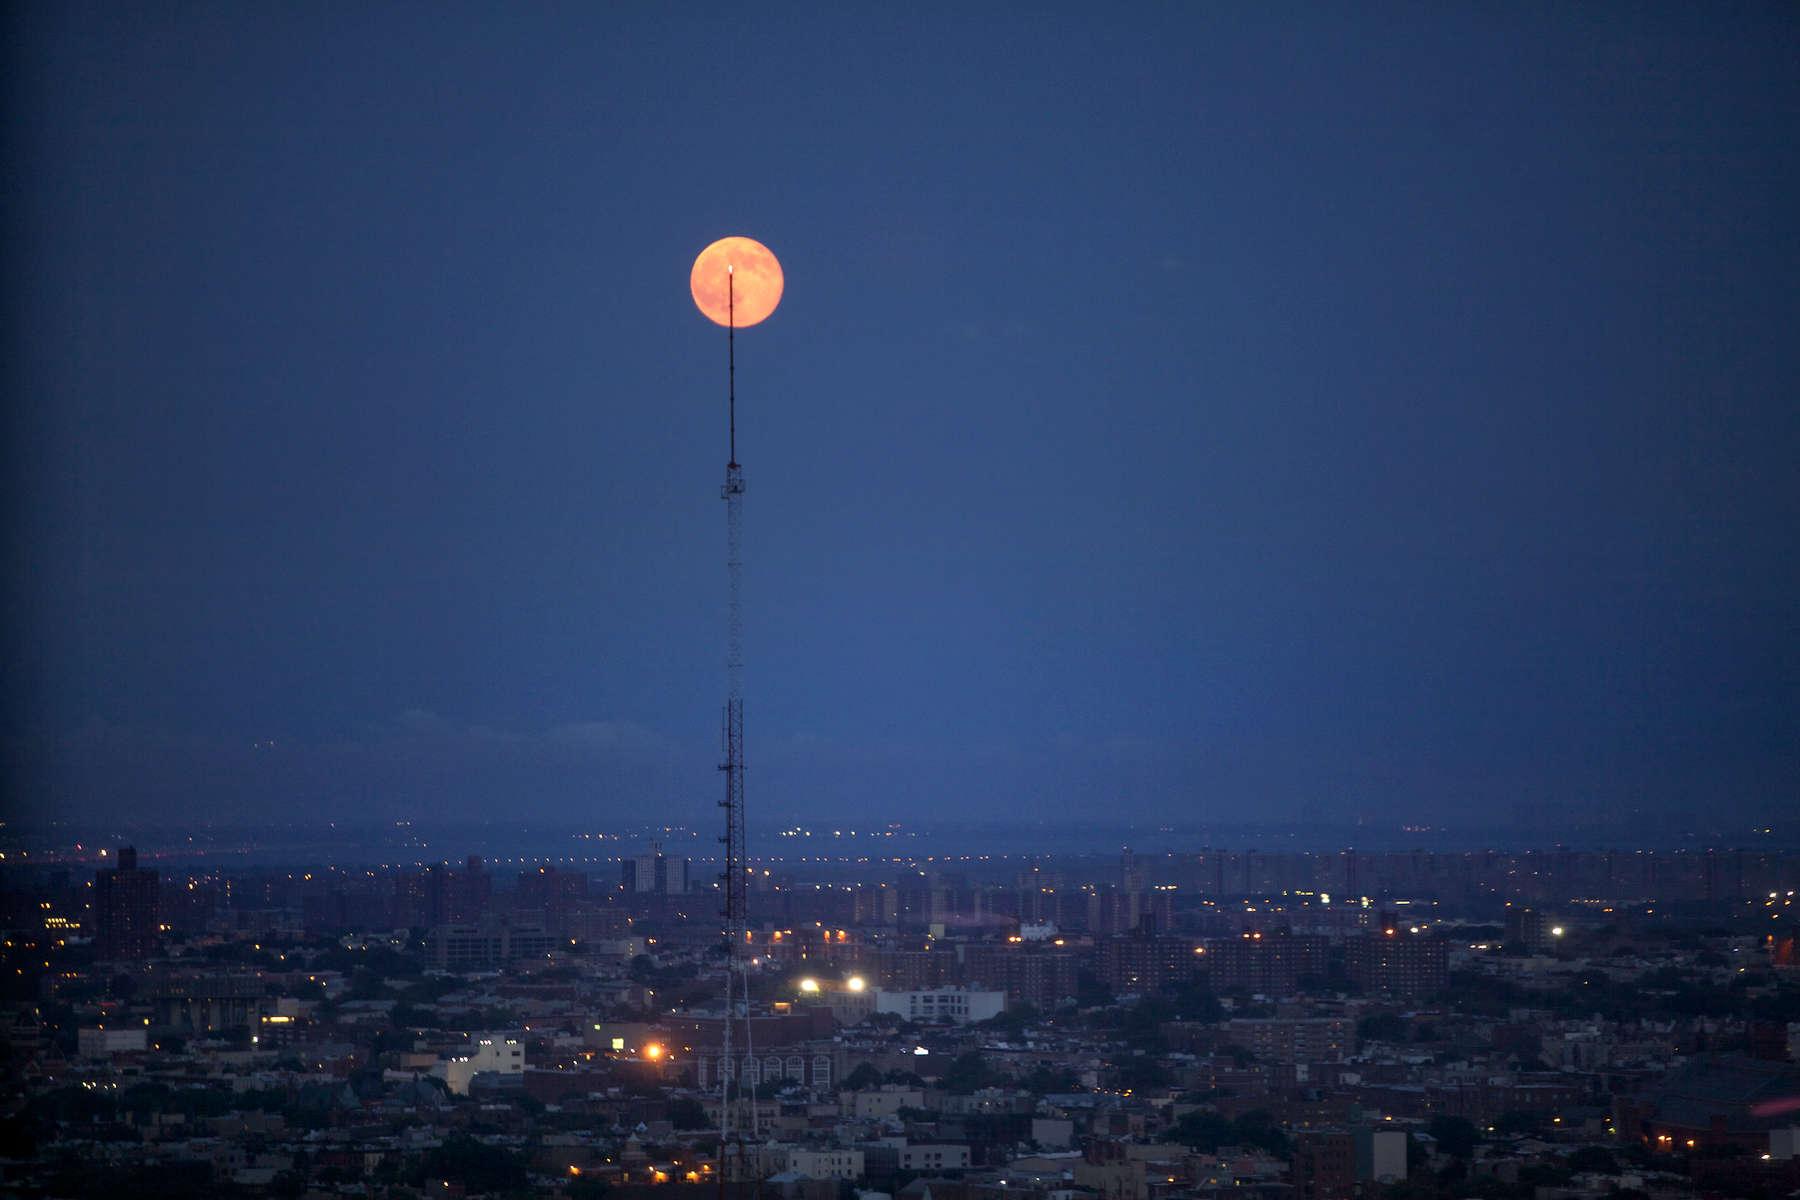 Super moon over Brooklyn, NY